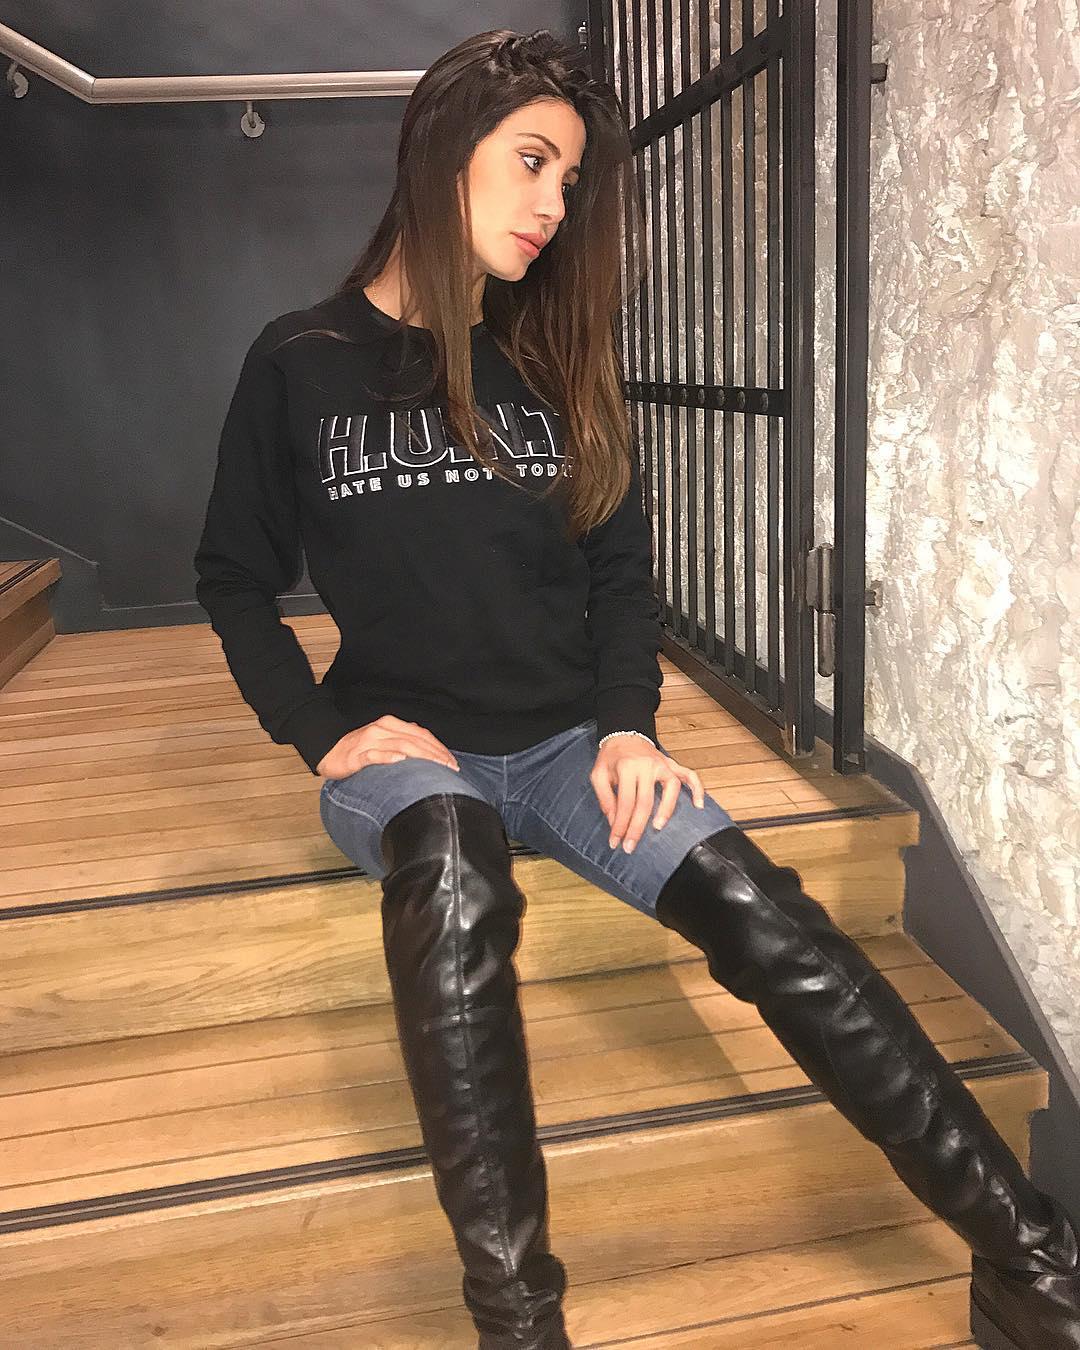 Elisabetta-Galimi-Wallpapers-Insta-Fit-Bio-3